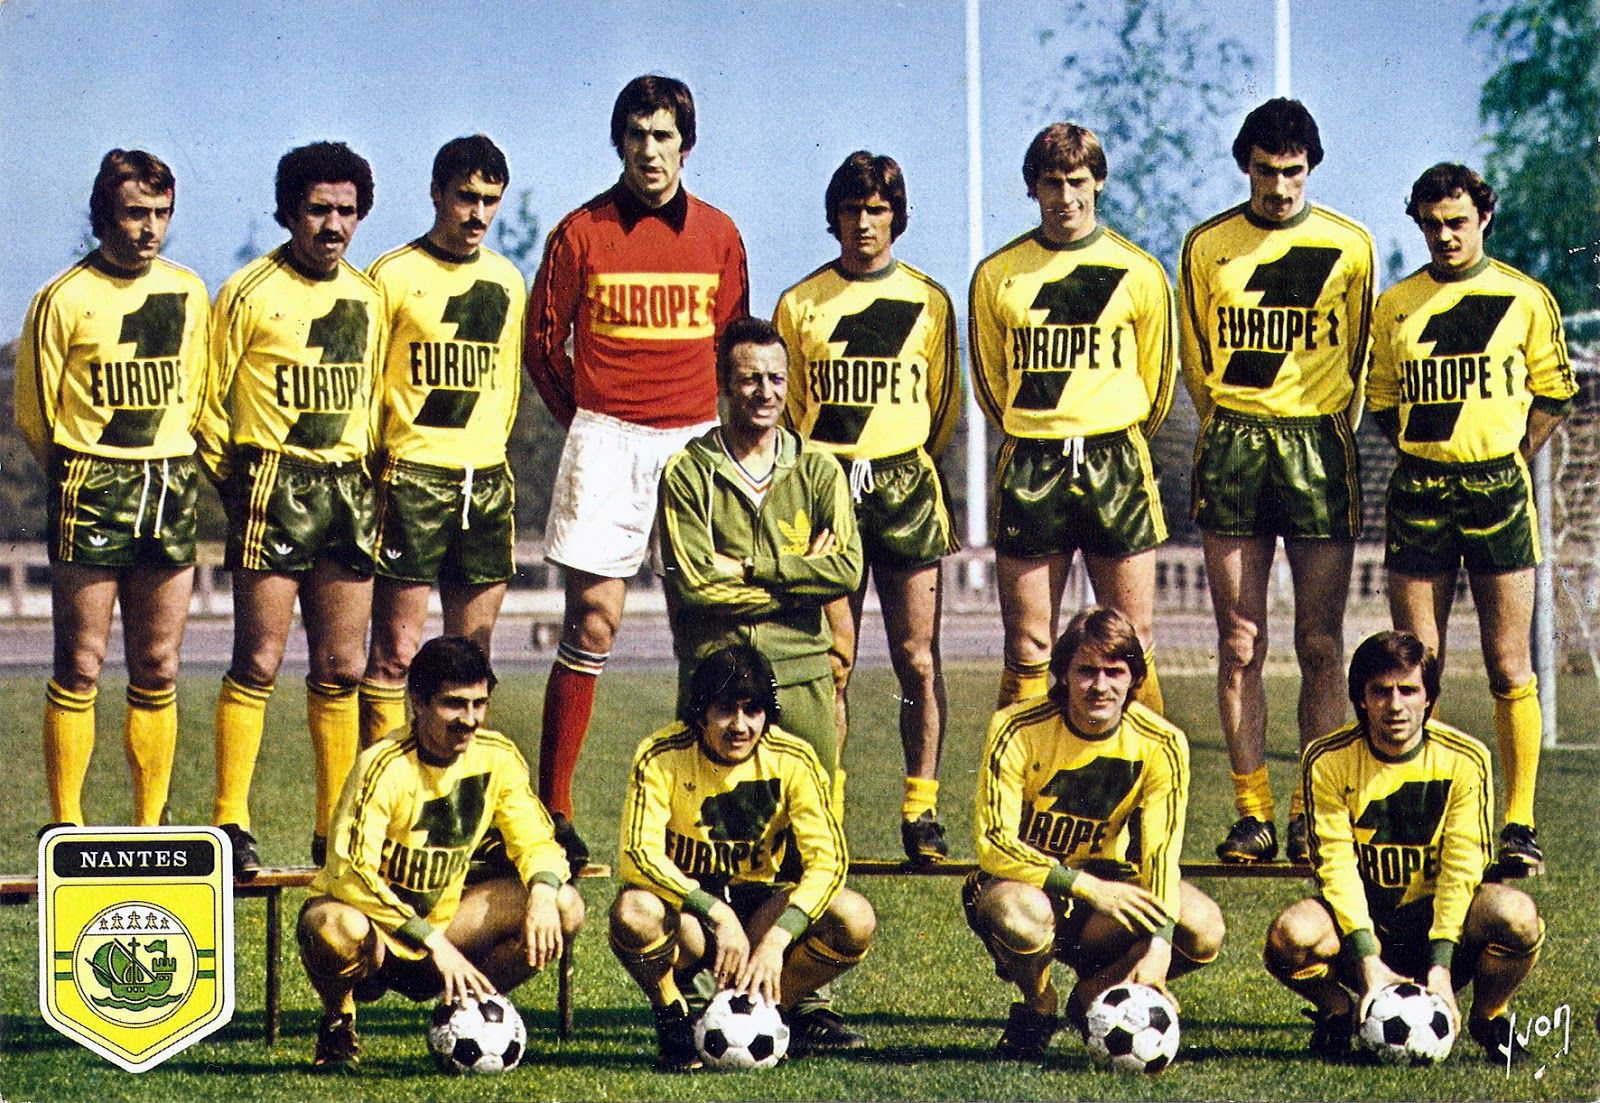 F.C NANTES 197778 Debouts Raynald Denoueix, Omar